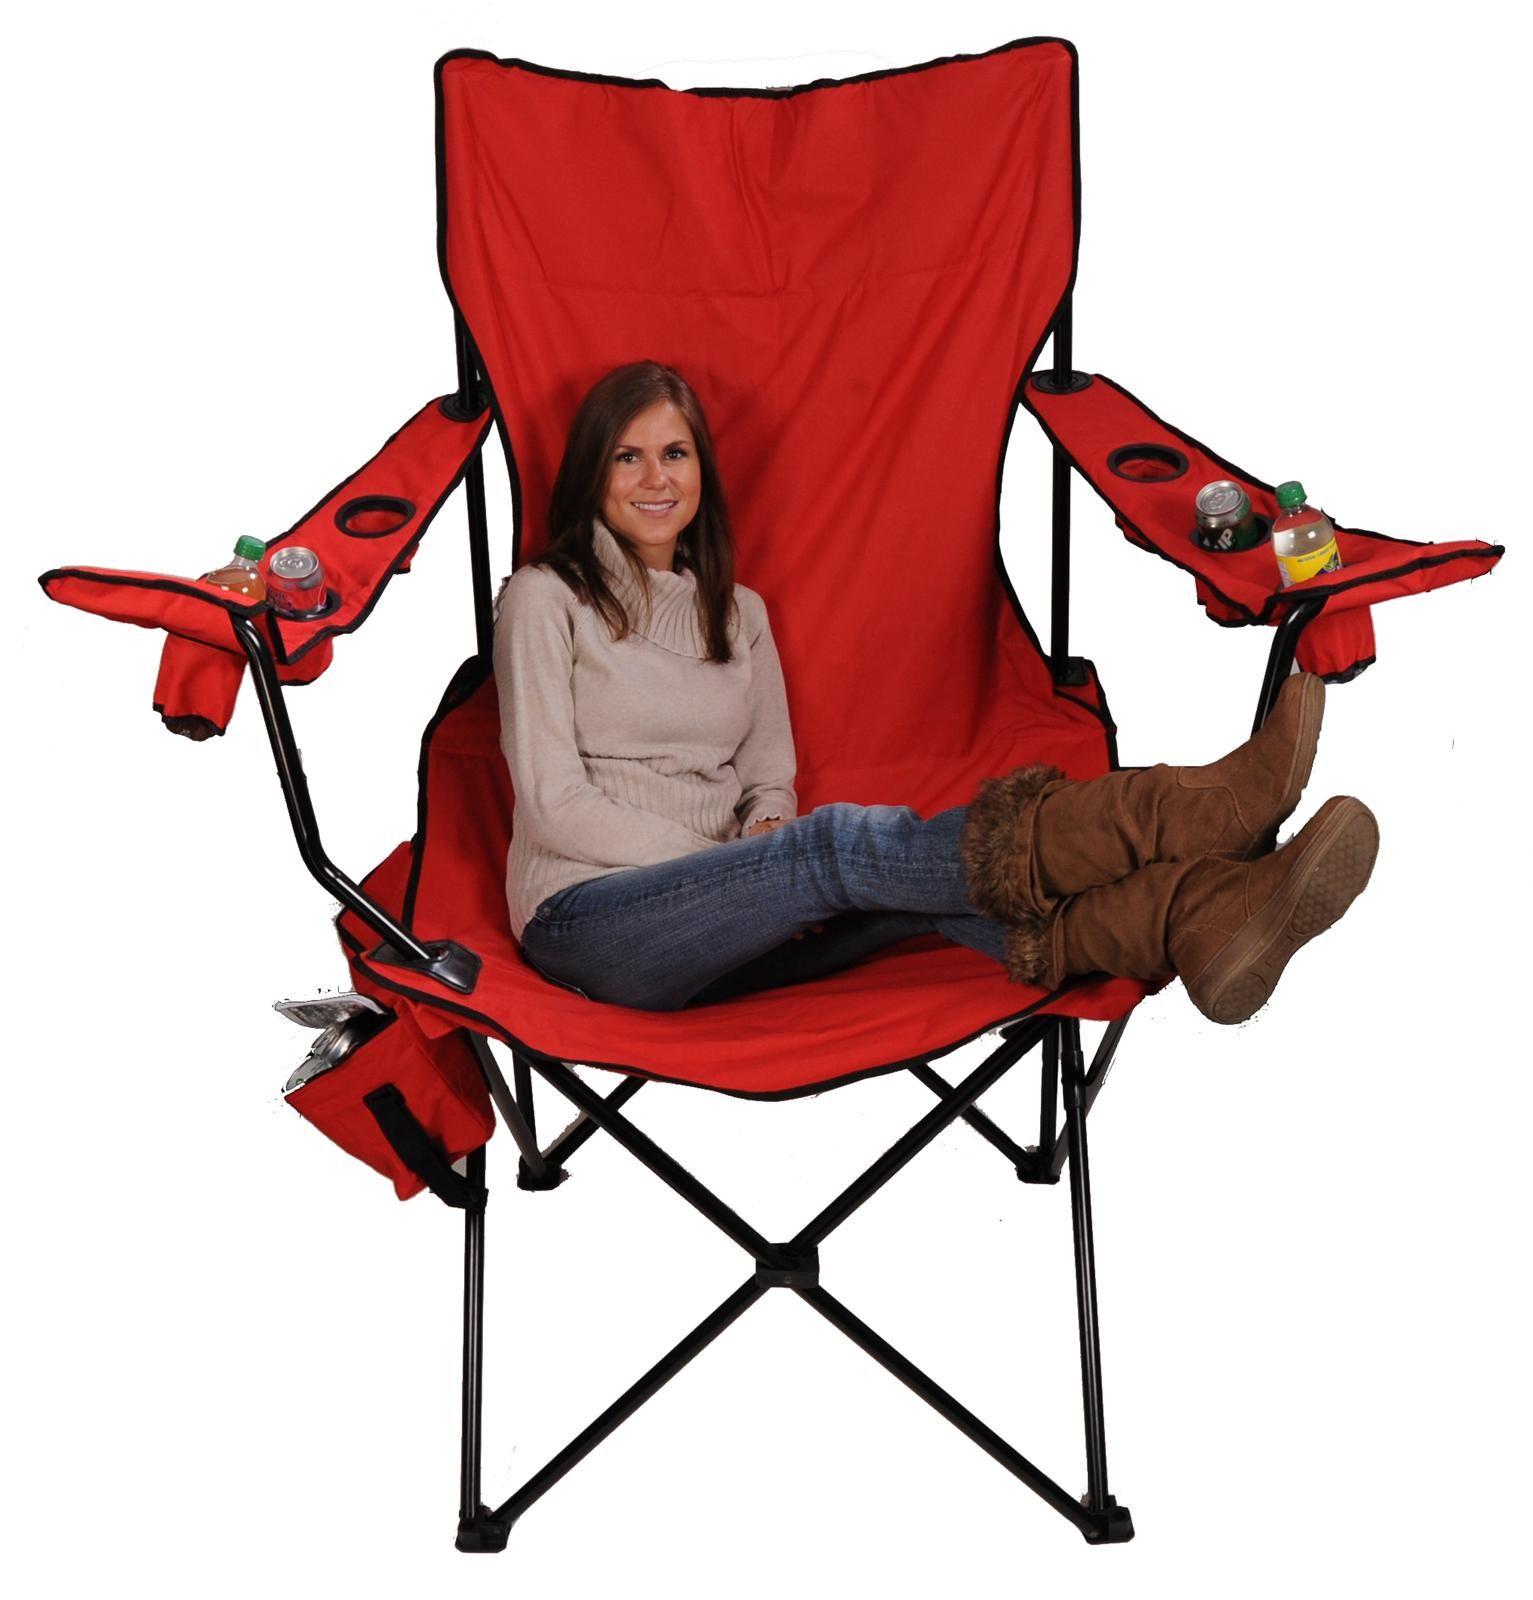 On The Edge Marketing Kingpin Folding Chairs 810170 Free